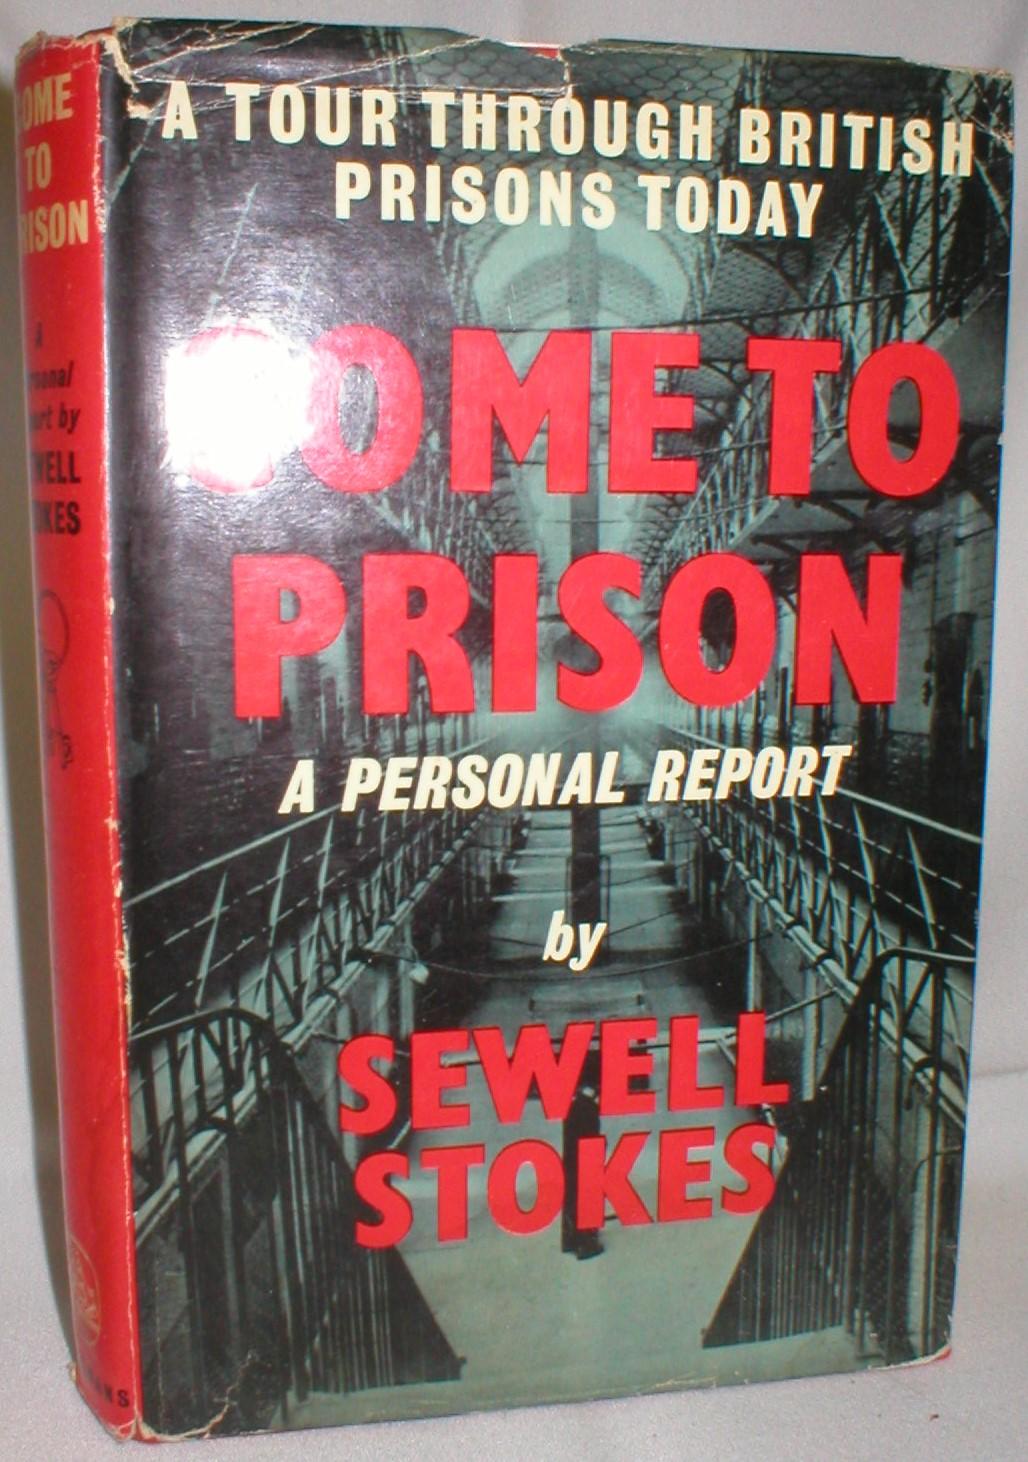 Come to Prison; A Tour Through British Prisons Today